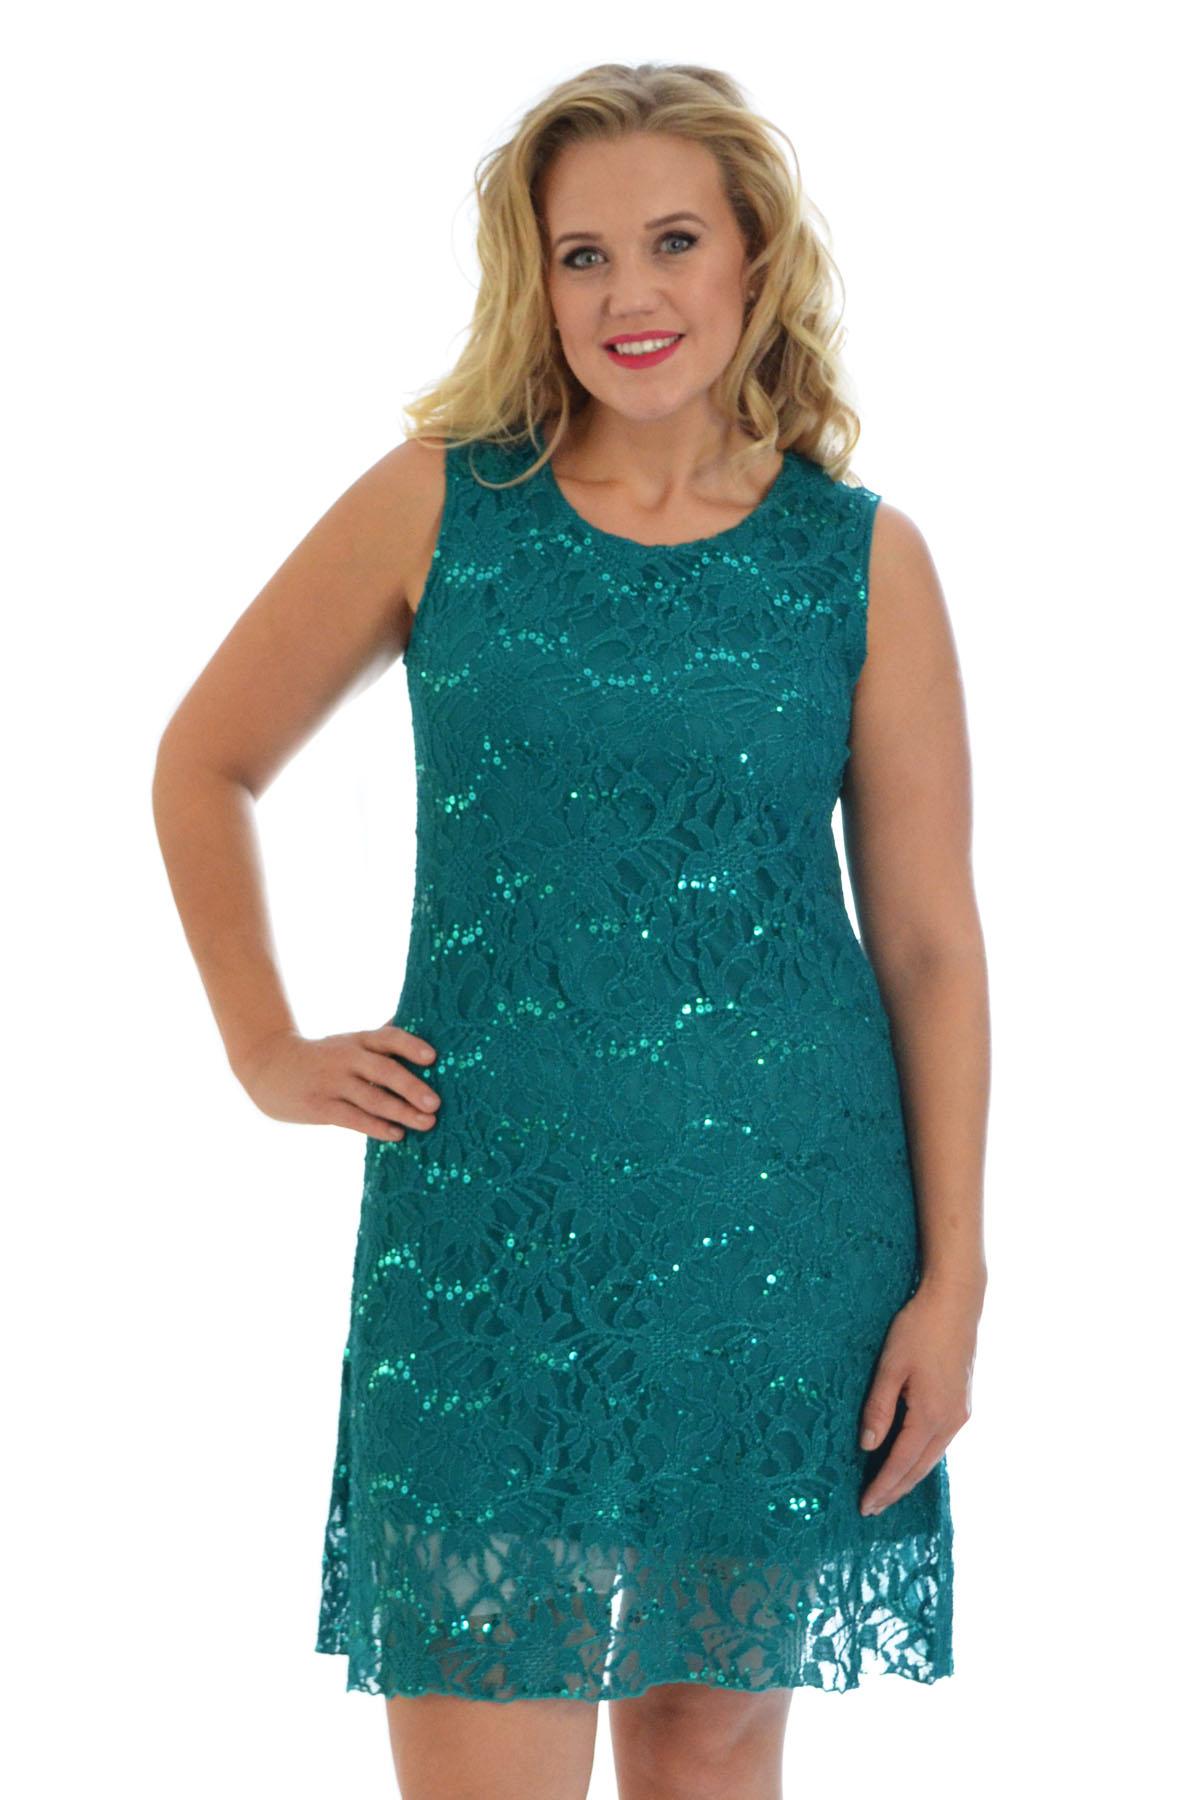 Womens Plus Size Dress Ladies Floral Lace Sequin Party Tunic ...